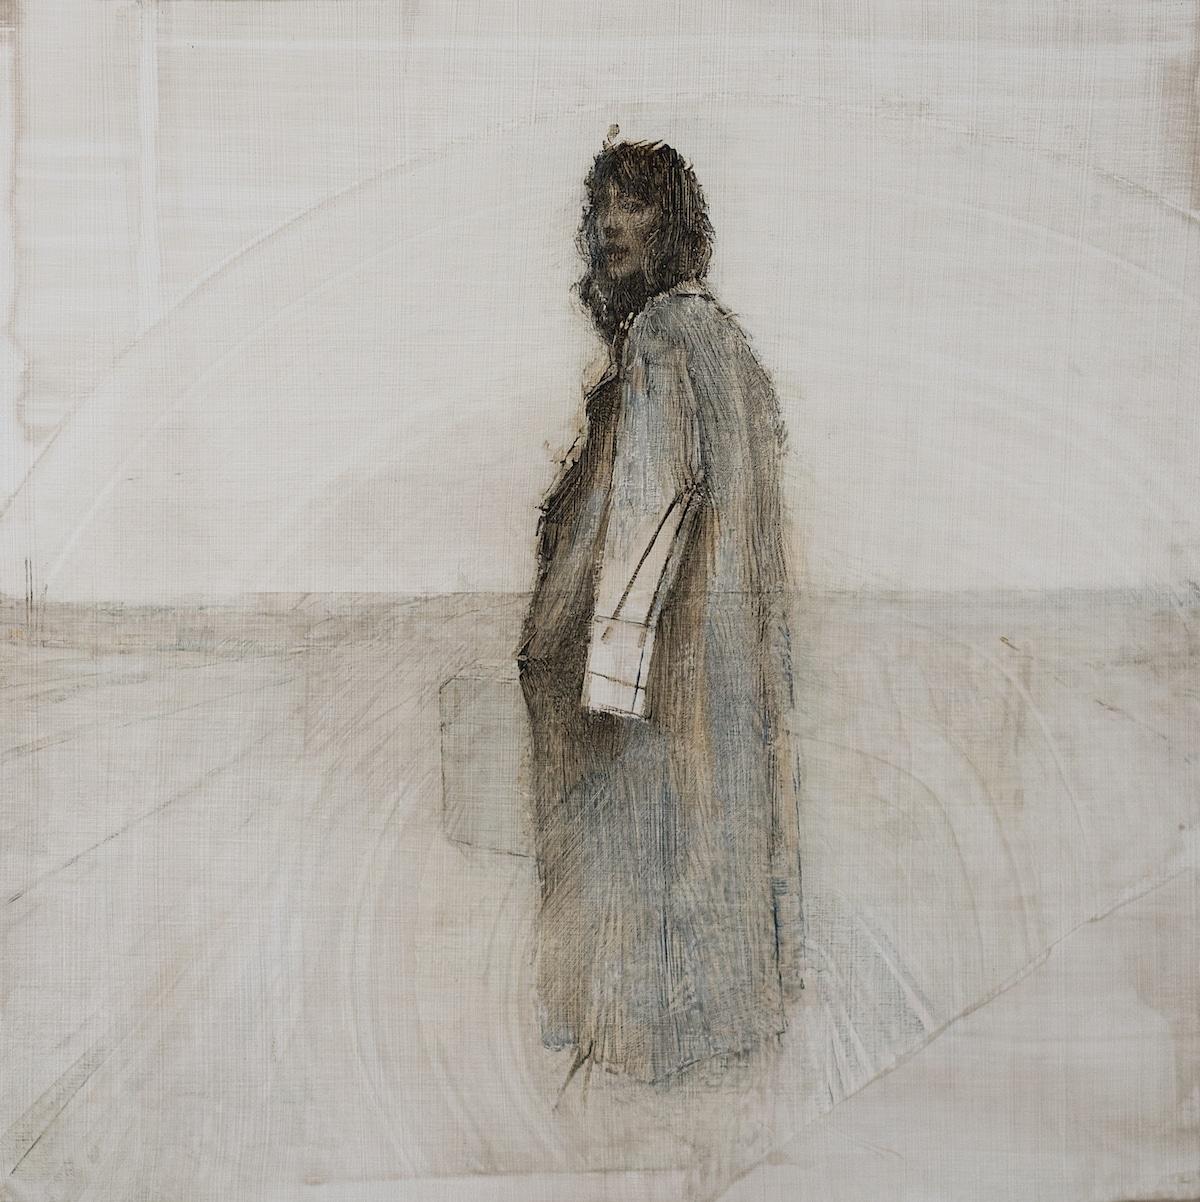 Expressive Oil Paintings by Daniel Bilmes